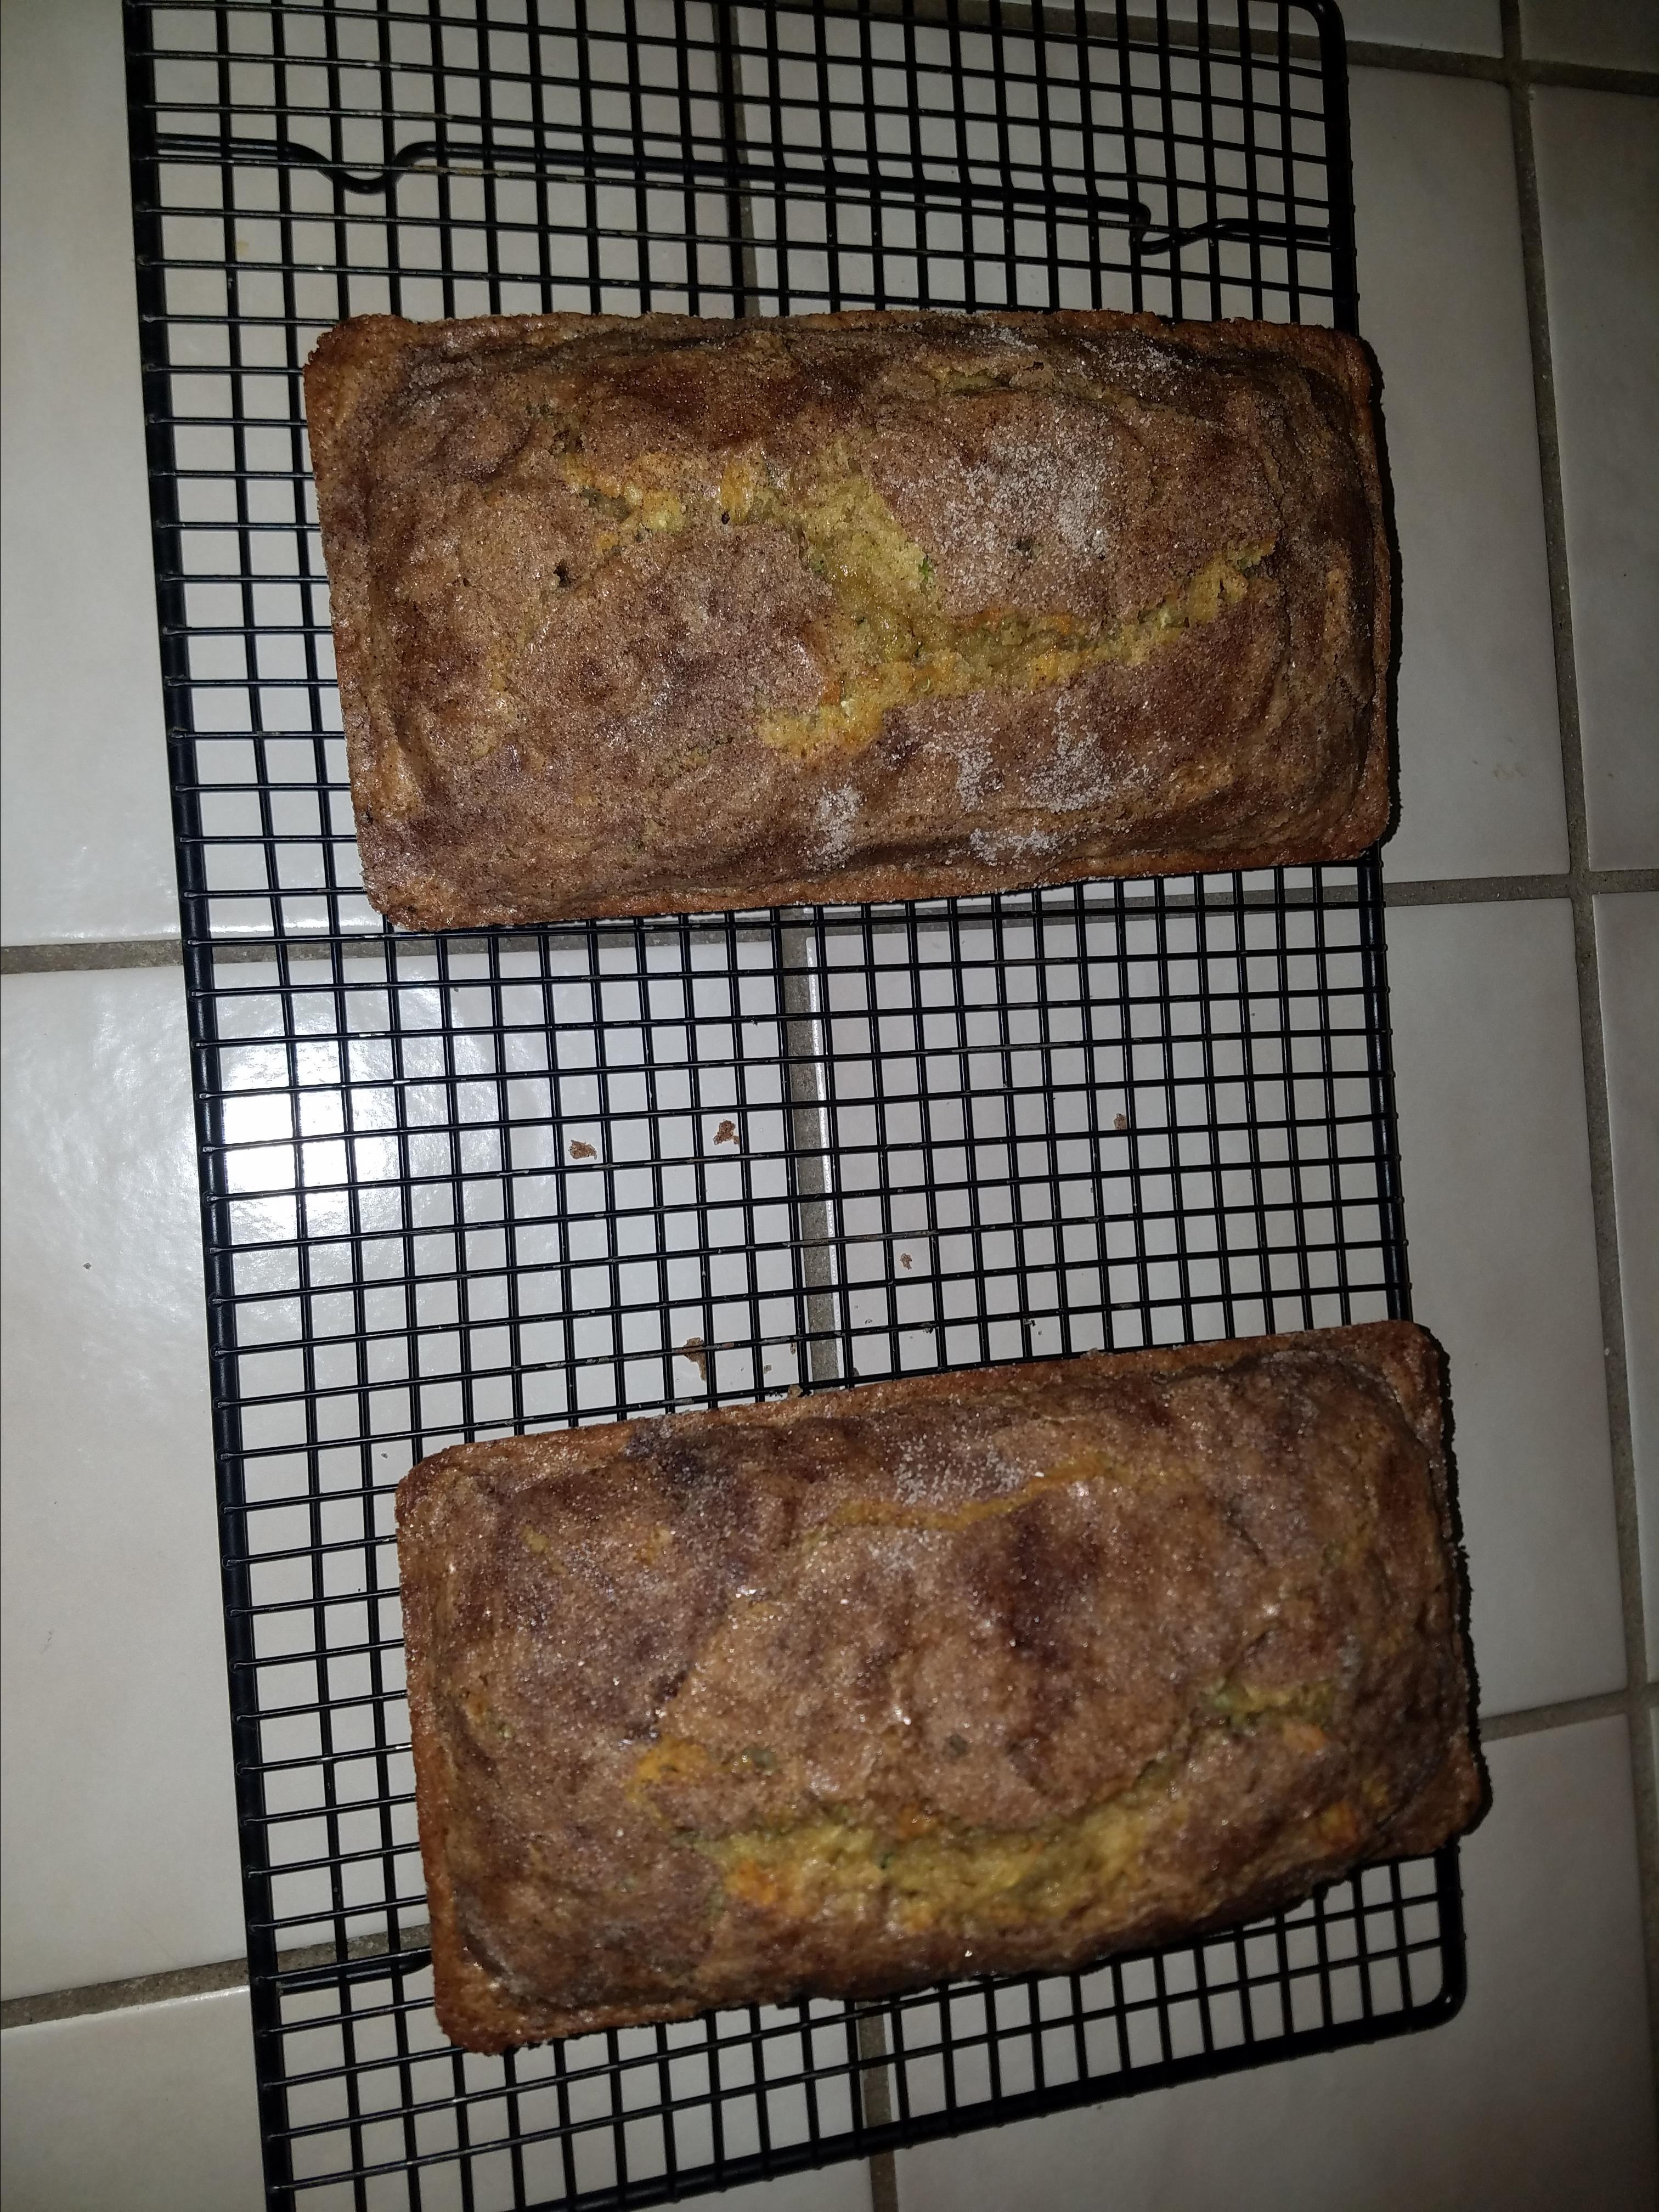 Zucchini Bread with Cinnamon Sugar Topping Trin